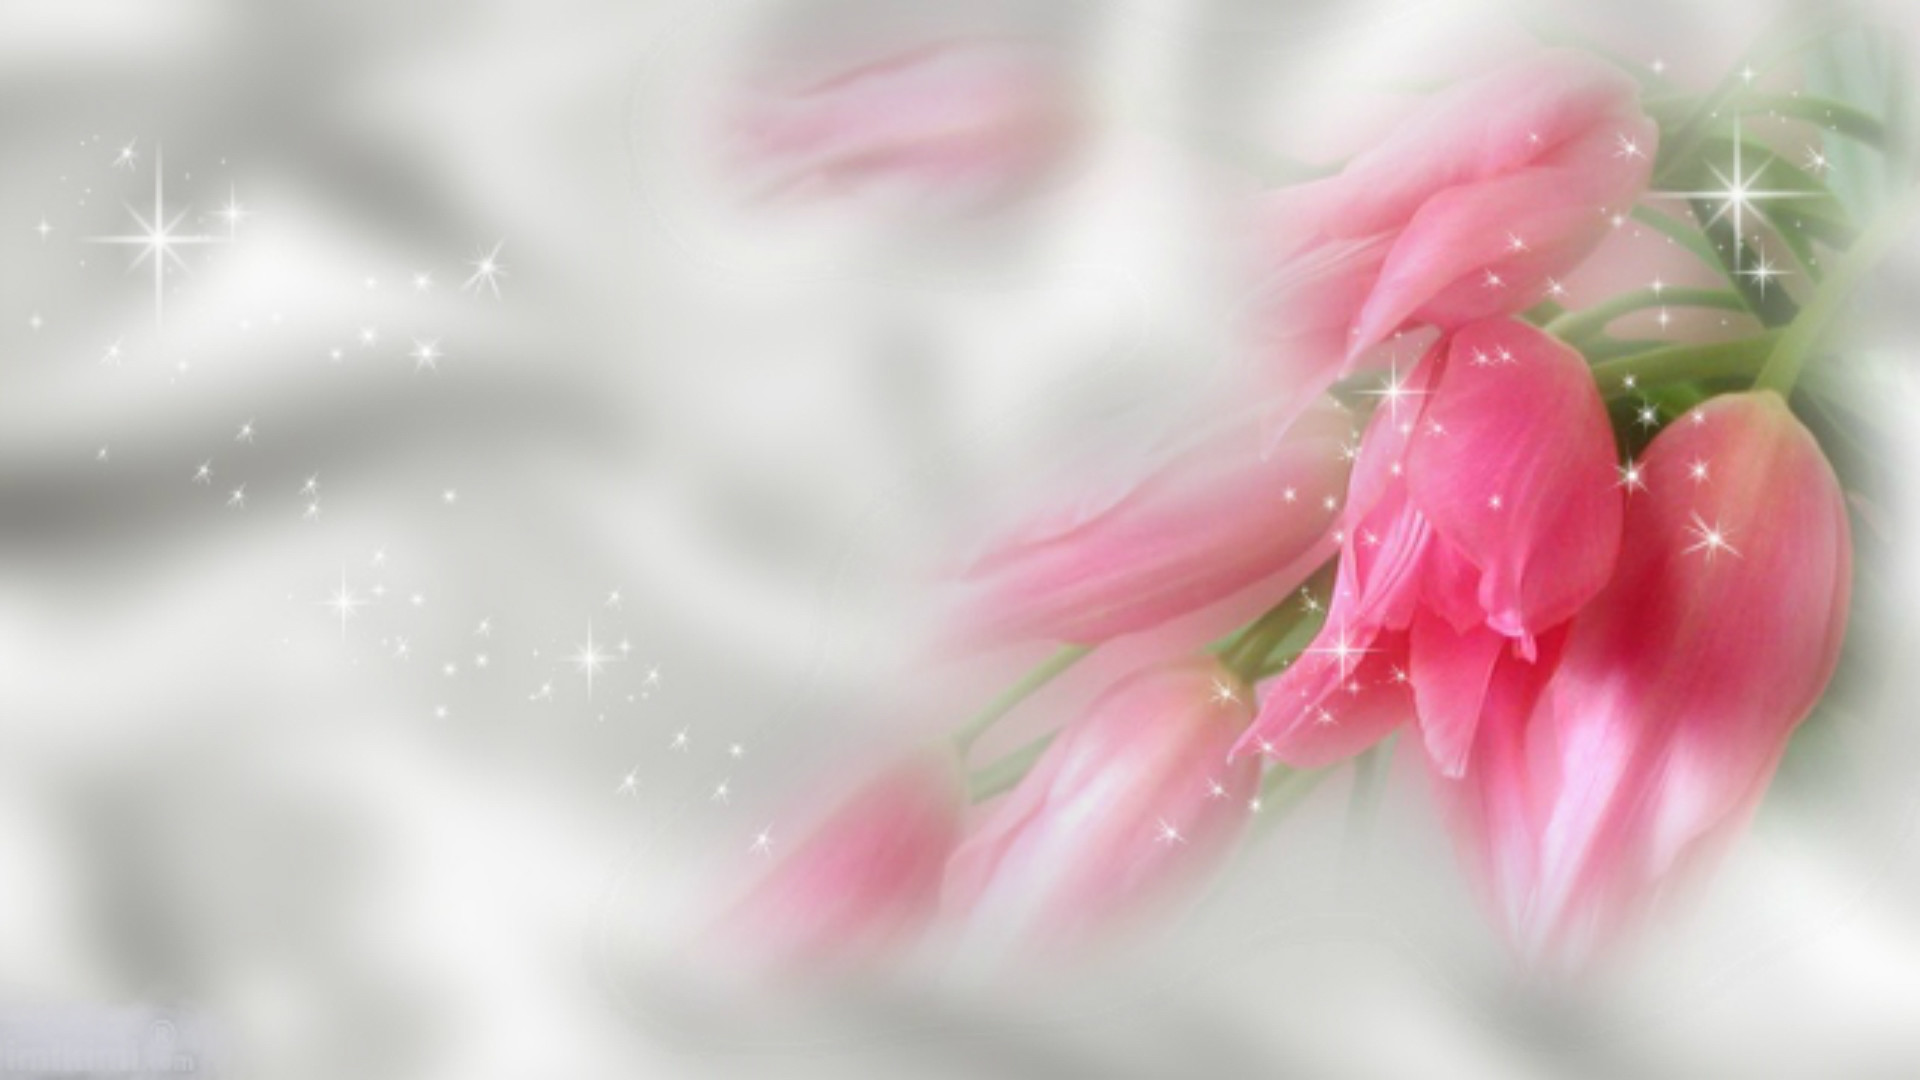 Full Hd P Flowers Wallpapers, Desktop Backgrounds Hd, - Desktop Wallpaper For Flower , HD Wallpaper & Backgrounds